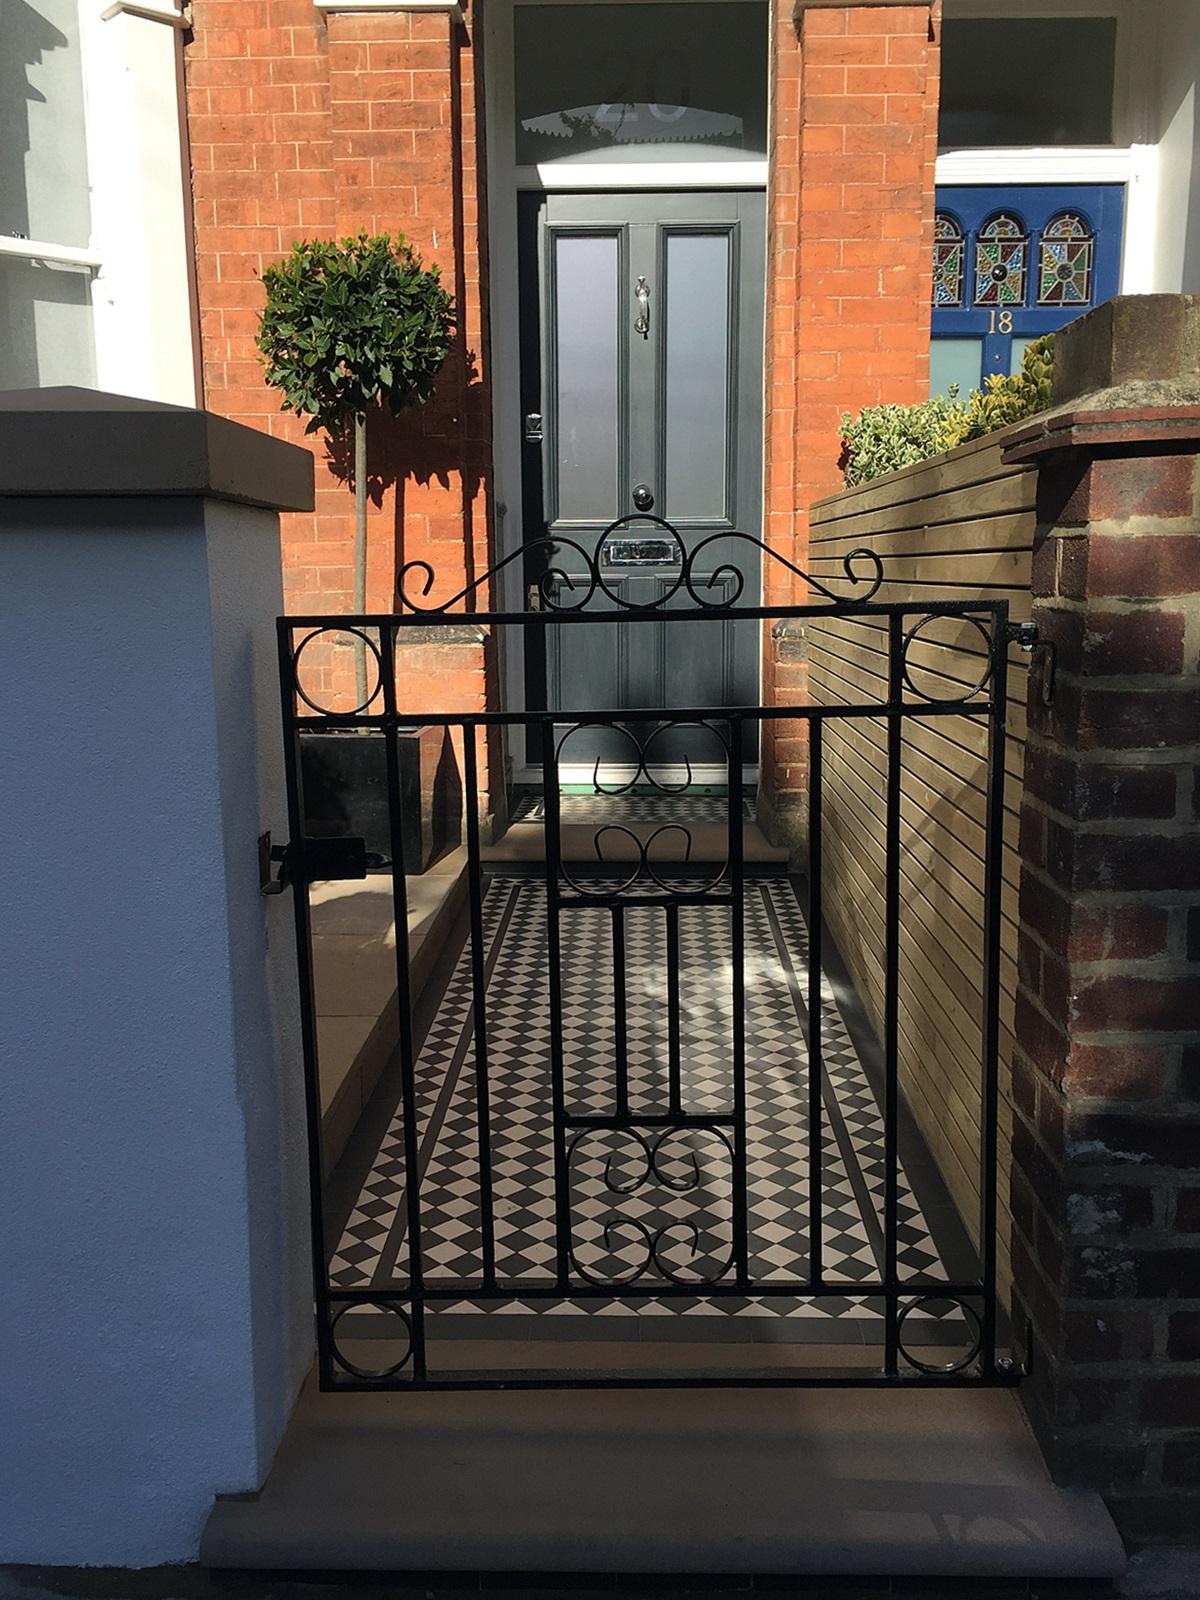 london victorian front garden company rail gate wall mosaic paving screen balham clapham dulwich fulham chelsea